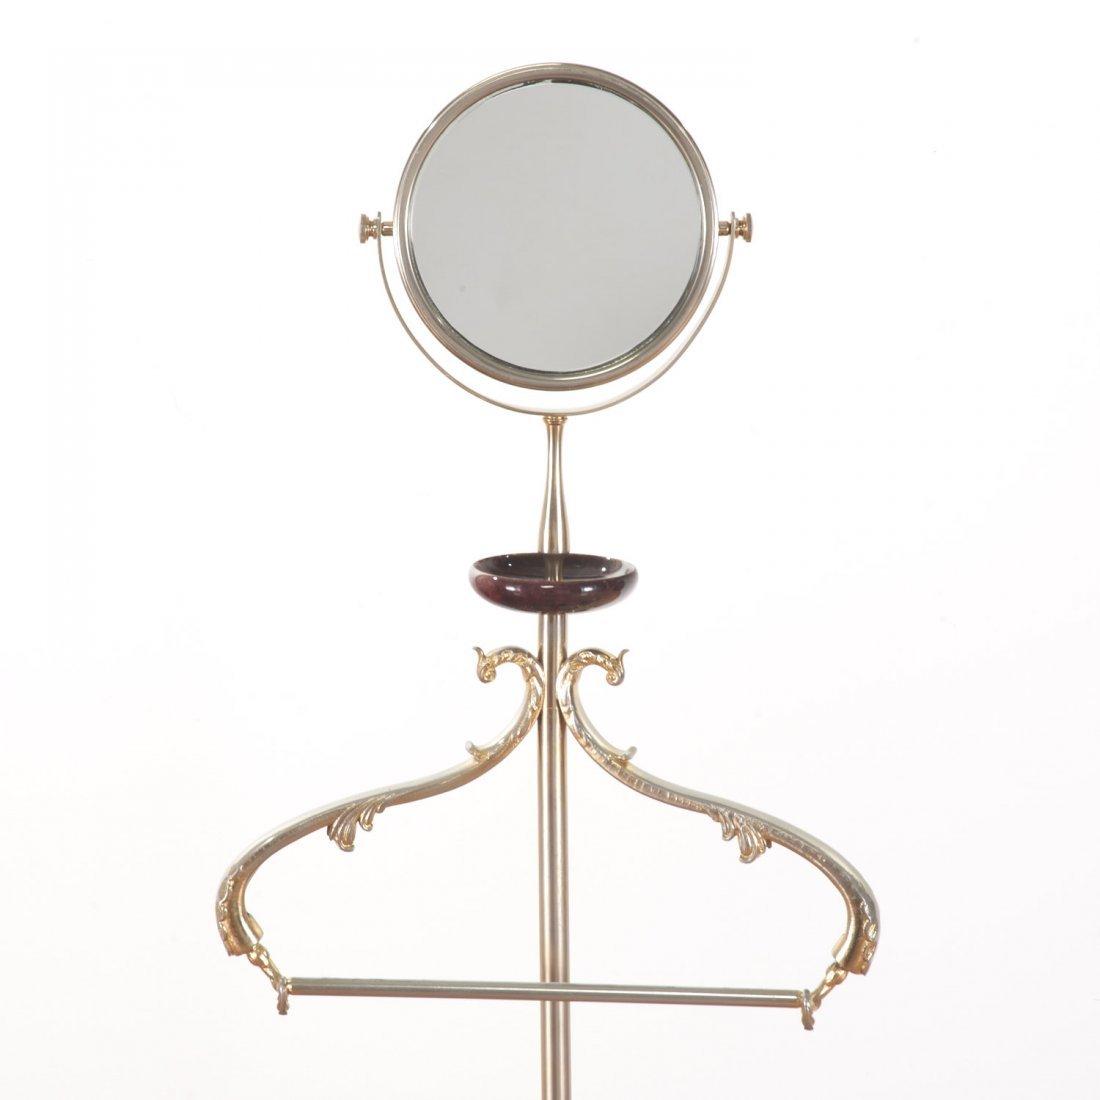 Aldo Tura lacquer, parchment valet/vanity stands - 3